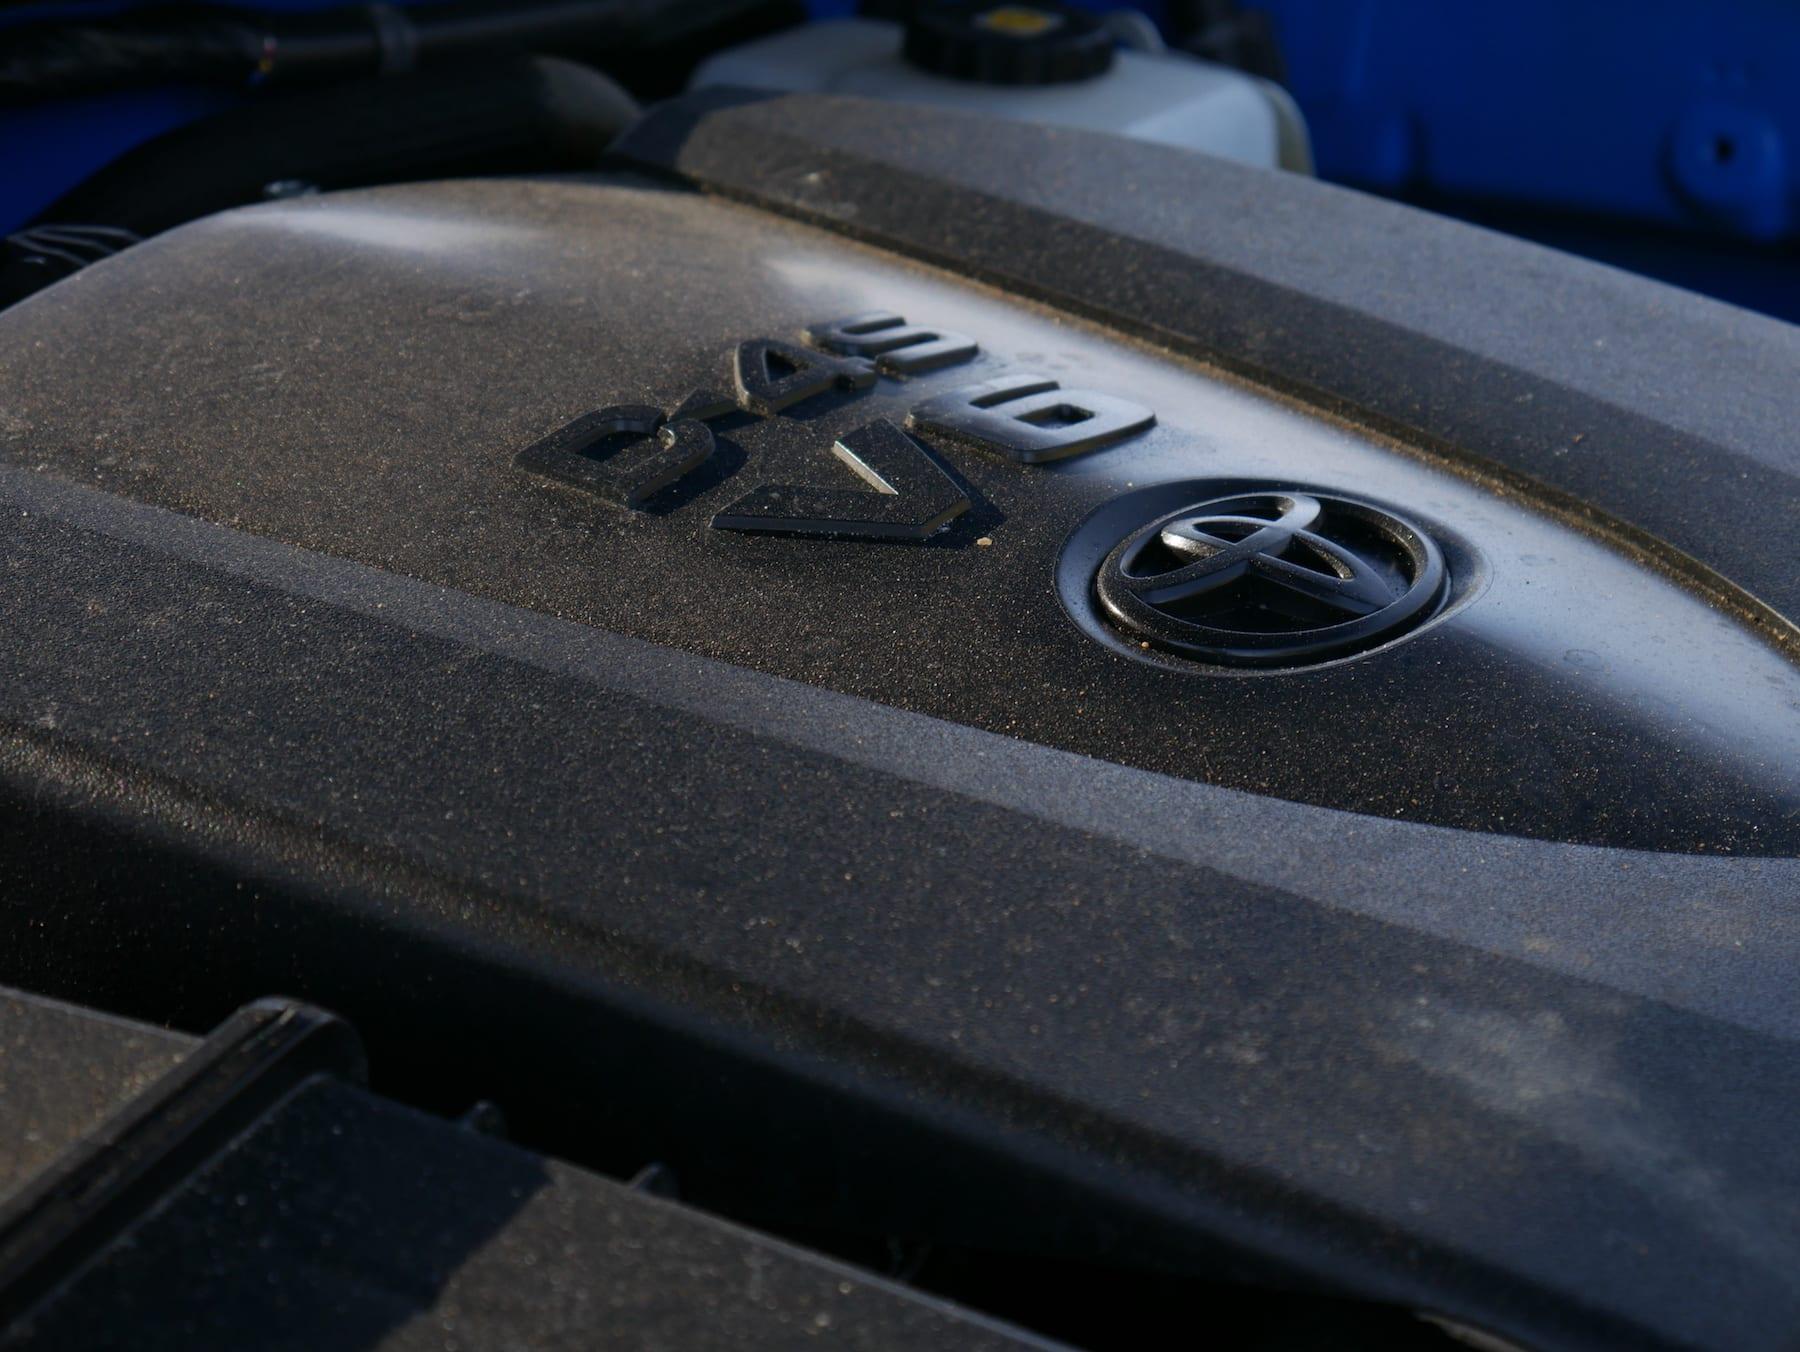 2019 Toyota Tacoma TRD Pro V6 engine